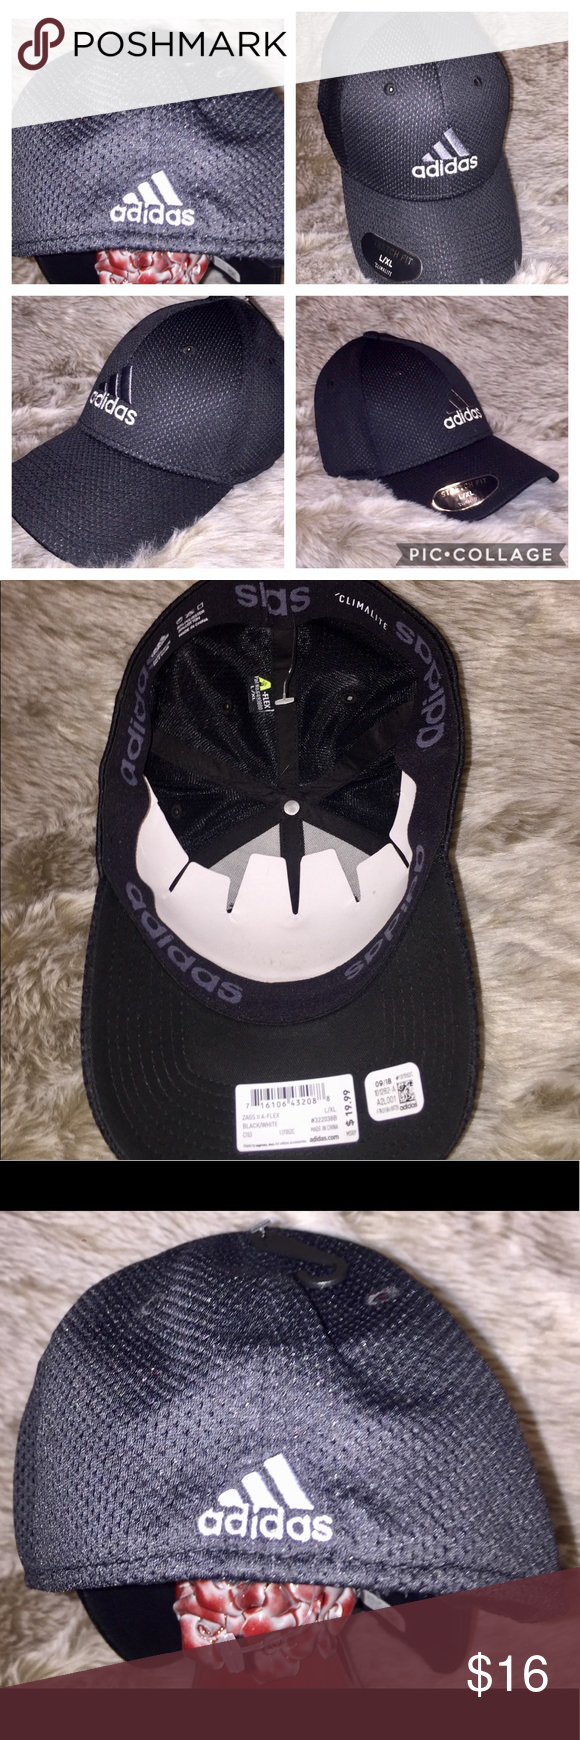 Adidas Hat Nwt Stretch Fit Sz L Xl Black Zags Adidas Hat Black Adidas Adidas